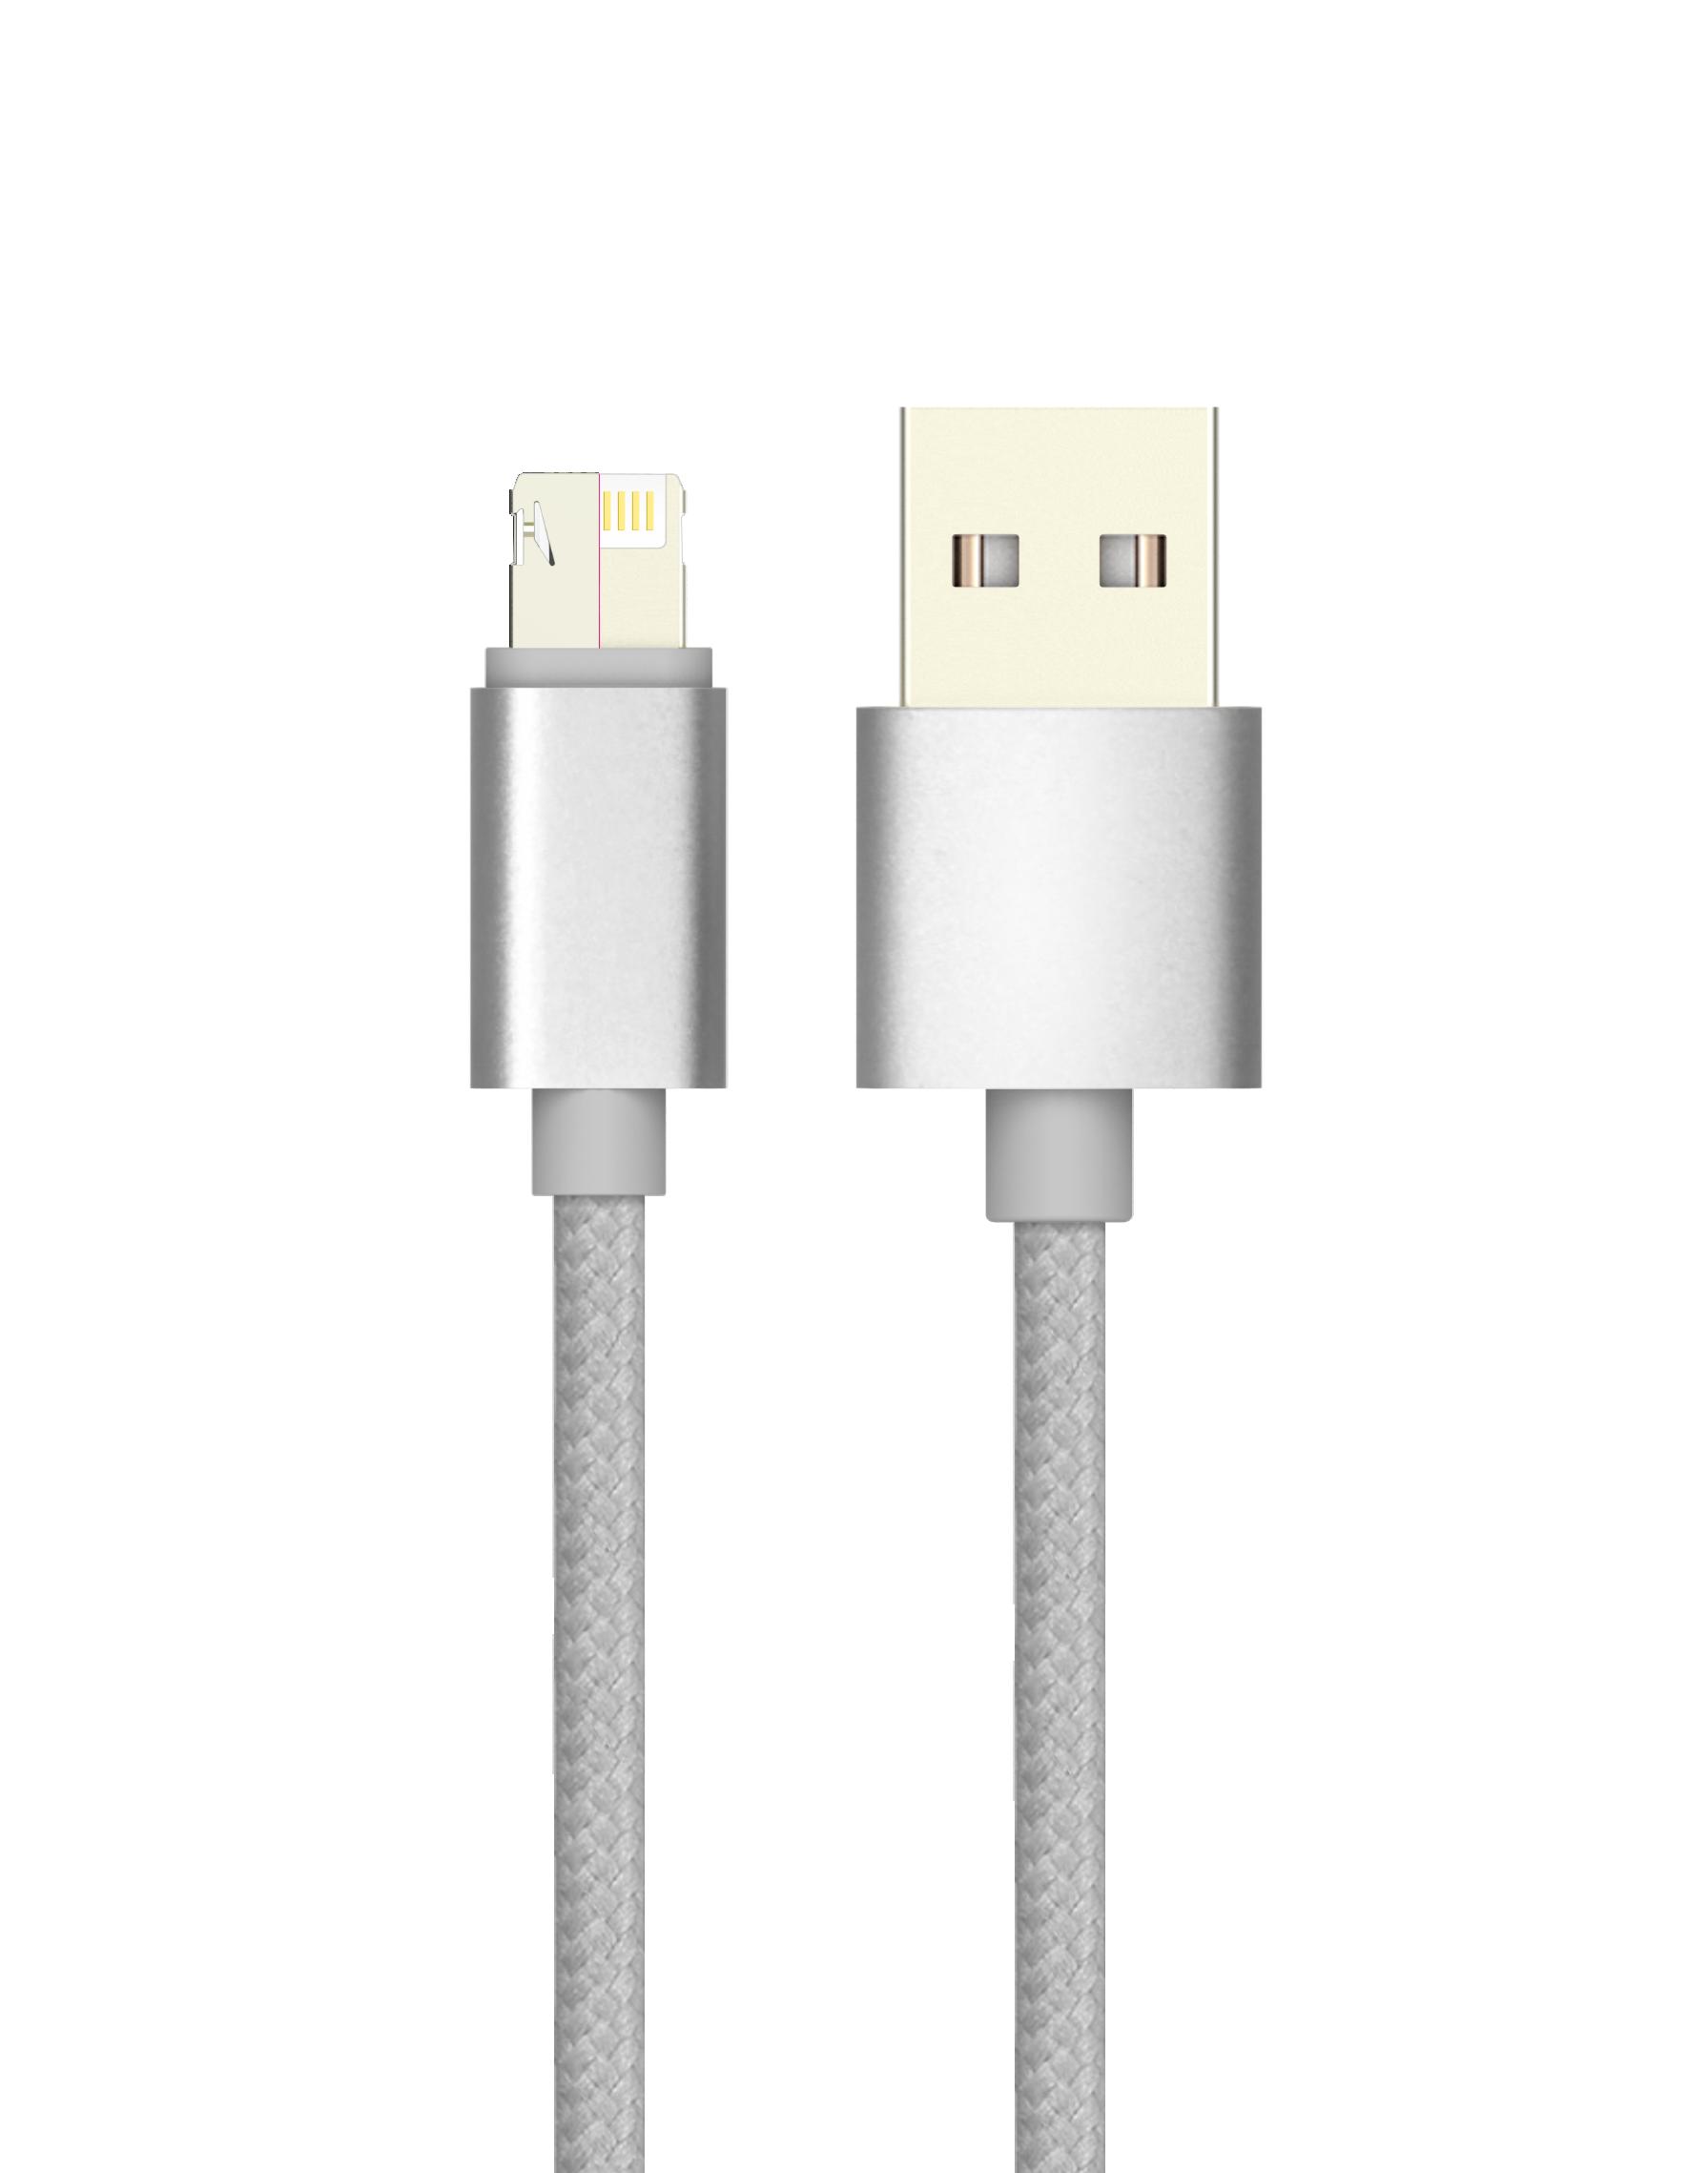 Кабель USB 2.0 - MAGIC 5/8 (microUSB+Lightning), 1м, 2.1А, Partner